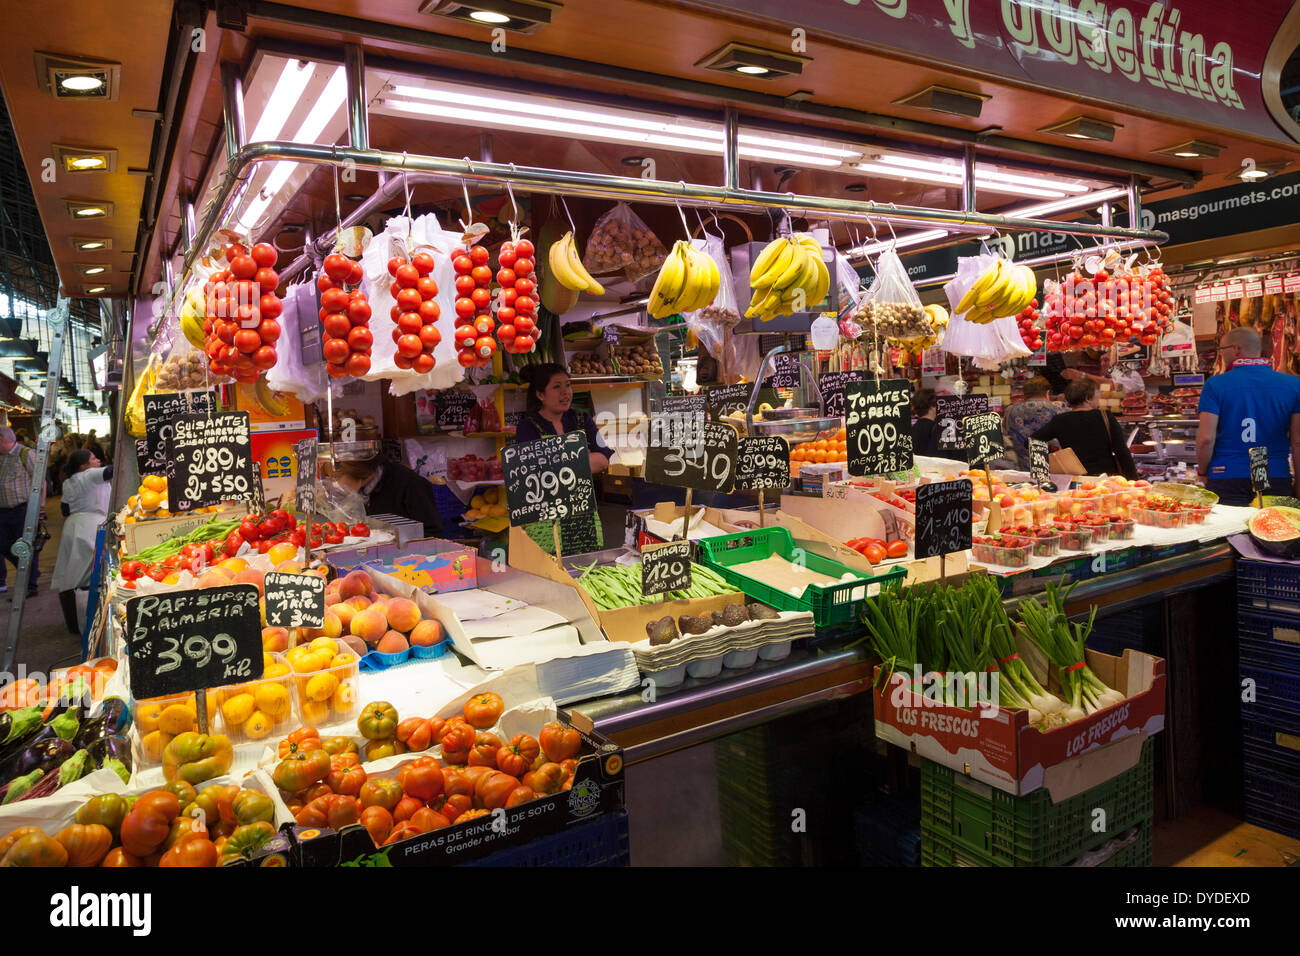 Display of produce on vegetable market stall in La Boqueria Market in Barcelona. - Stock Image